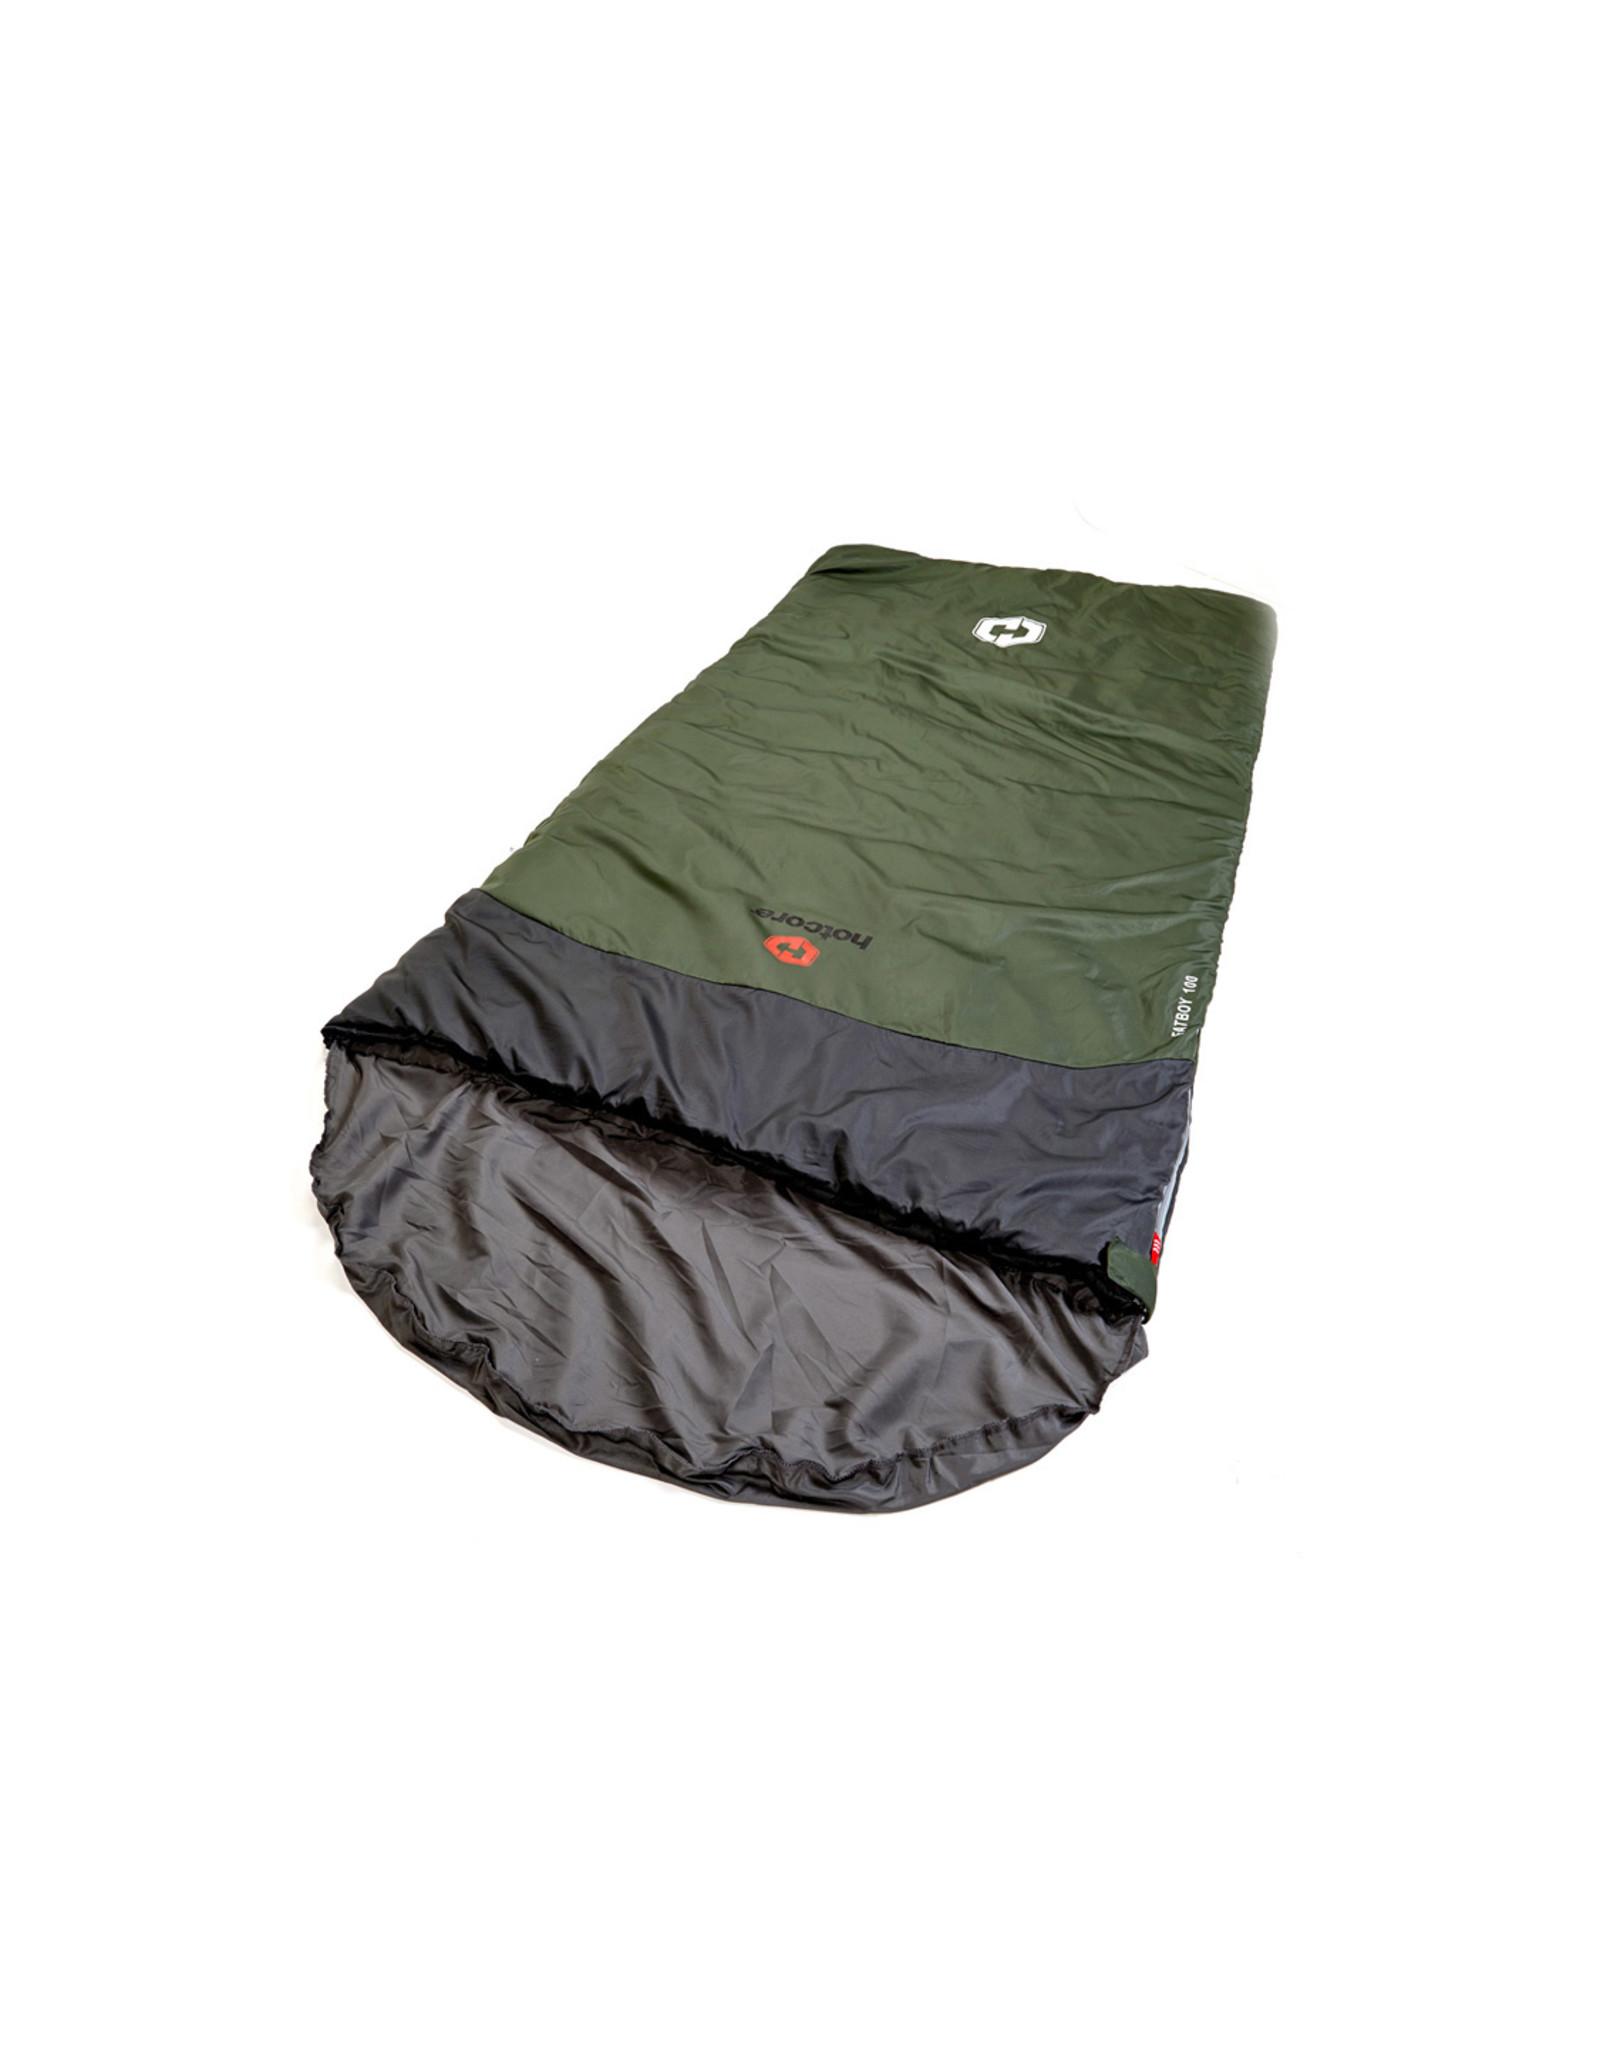 HOTCORE HOTCORE- FATBOY 100- OVERSIZED RECTANGULAR SLEEPING BAG, GREEN/ 7°C (44°F) Limit: 0°C (32°F)